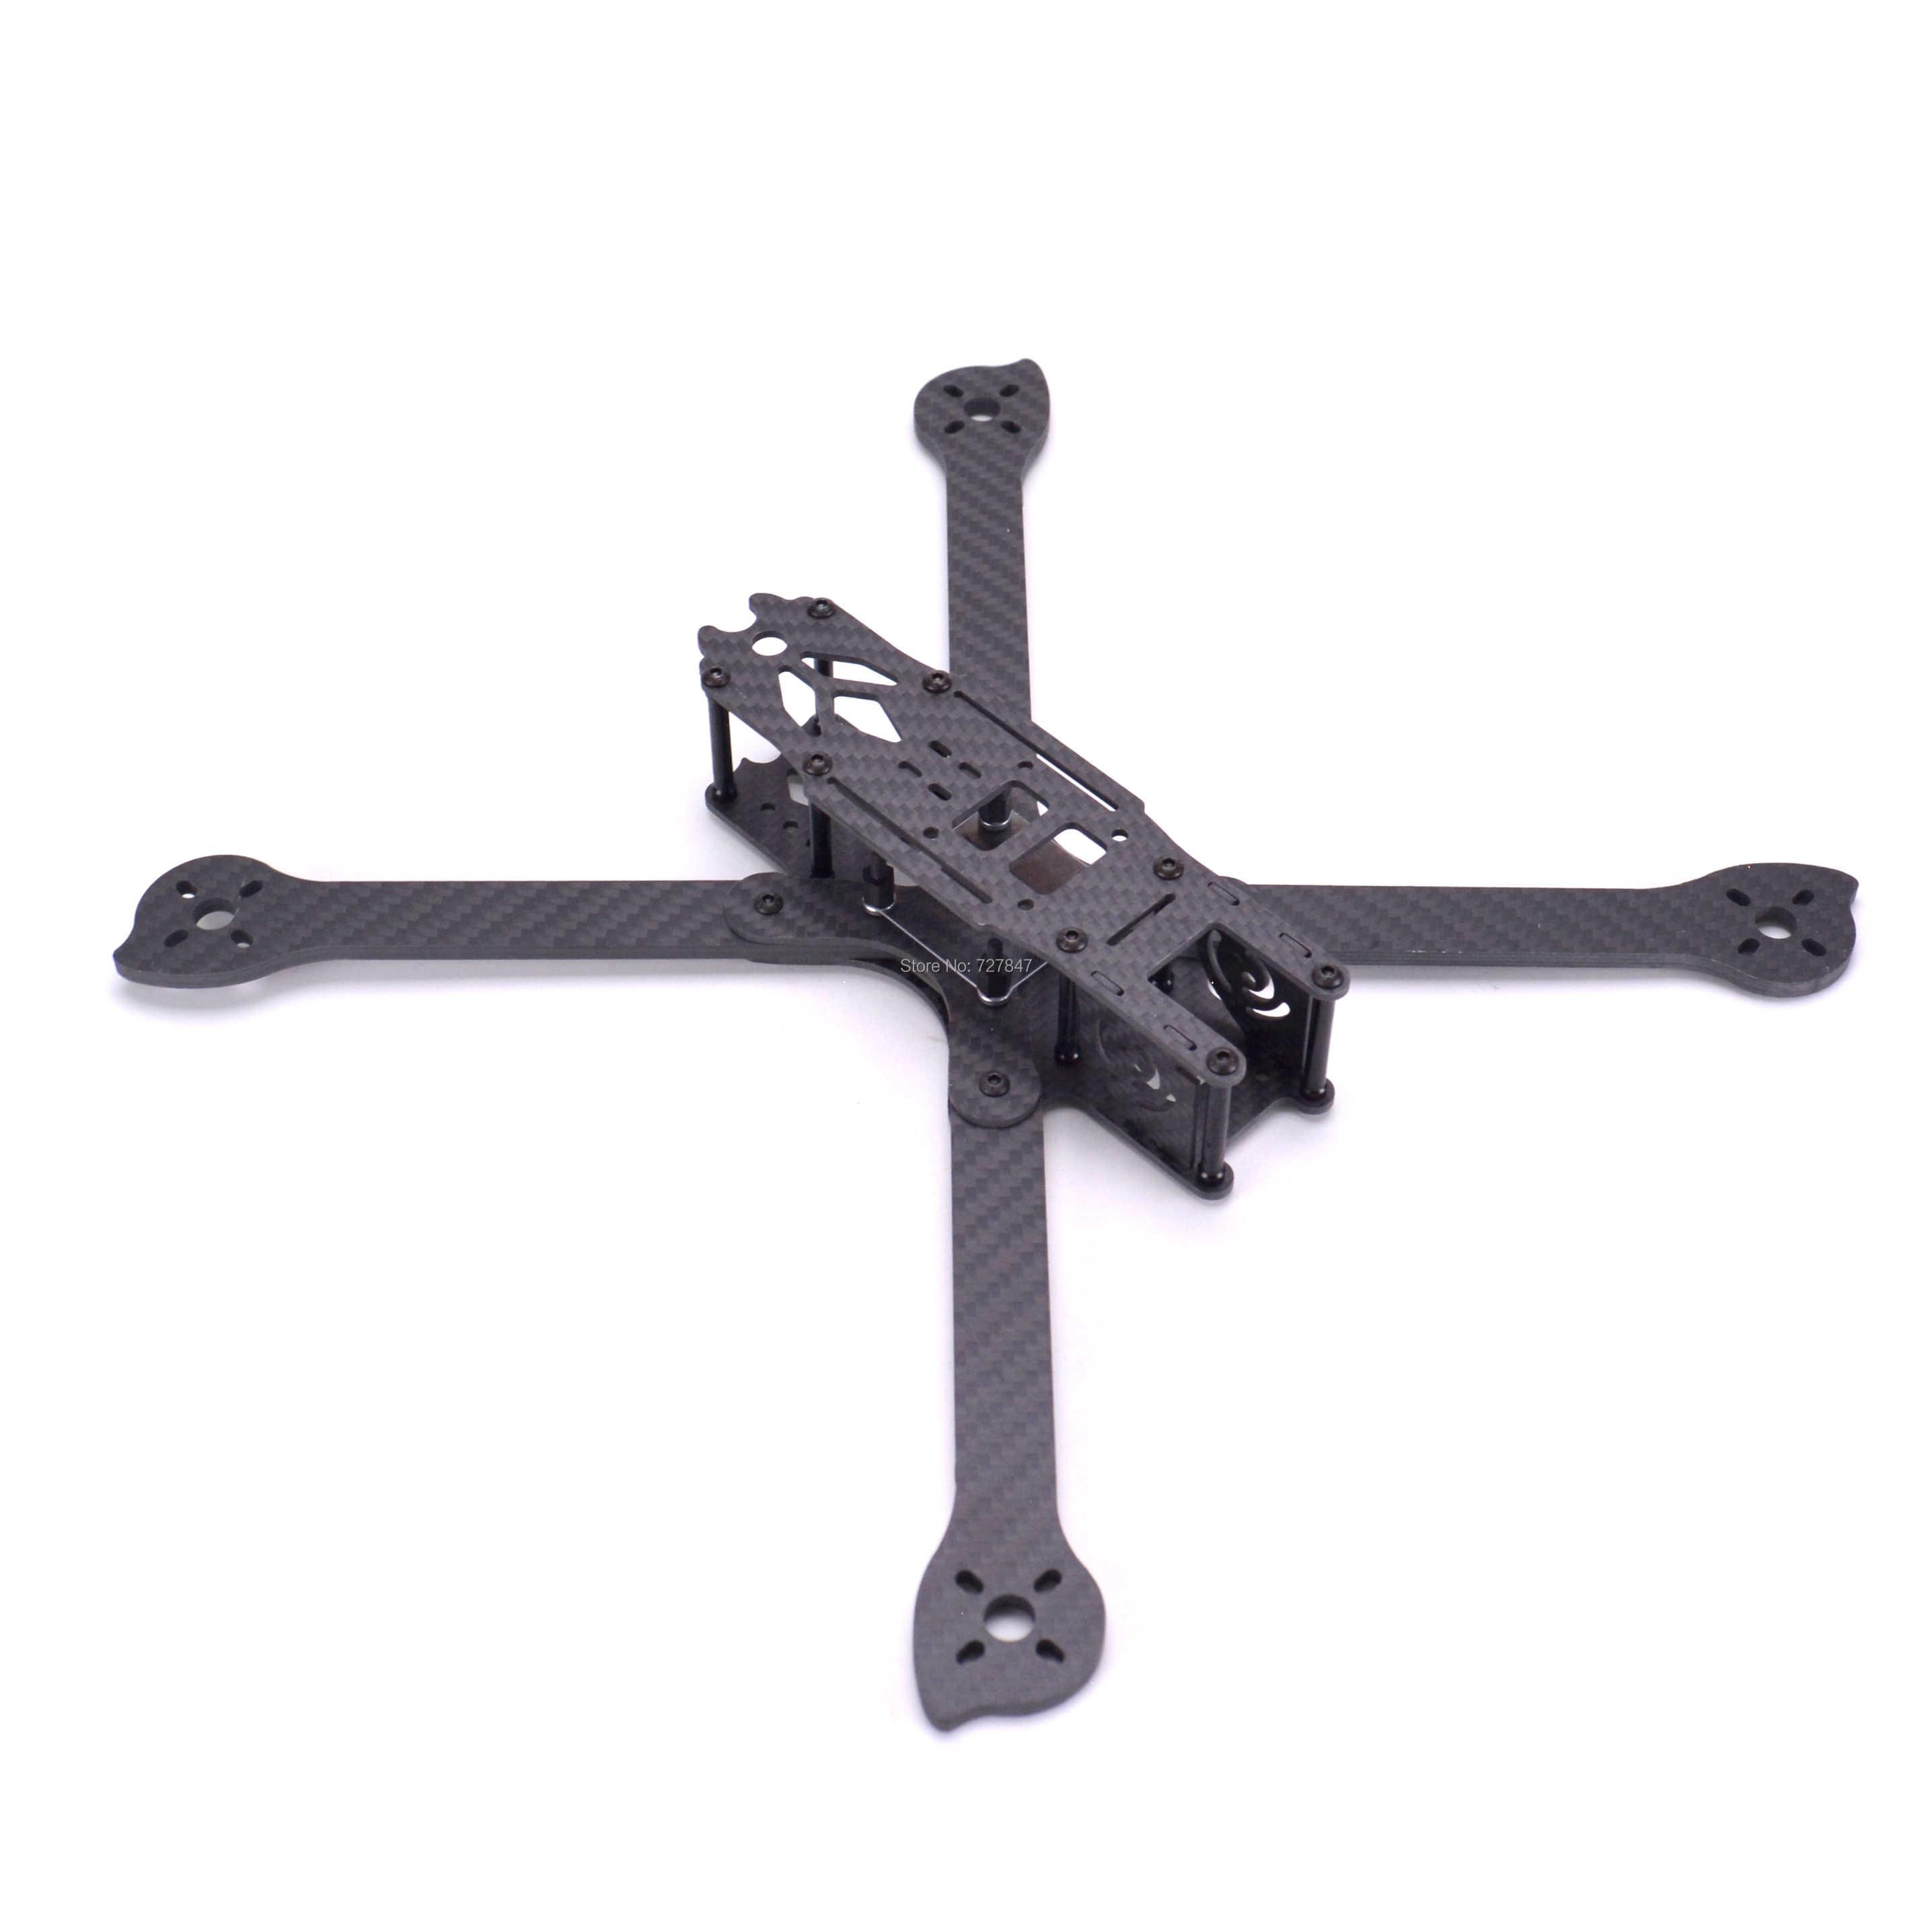 3K tam karbon Fiber TrueX XL5 V2 232mm/ XL6 V2 283mm / XL7 V2 294mm / XL8 V2 360mm/XL9 V2 390mm kol 4mm serbest çerçeve FPV için